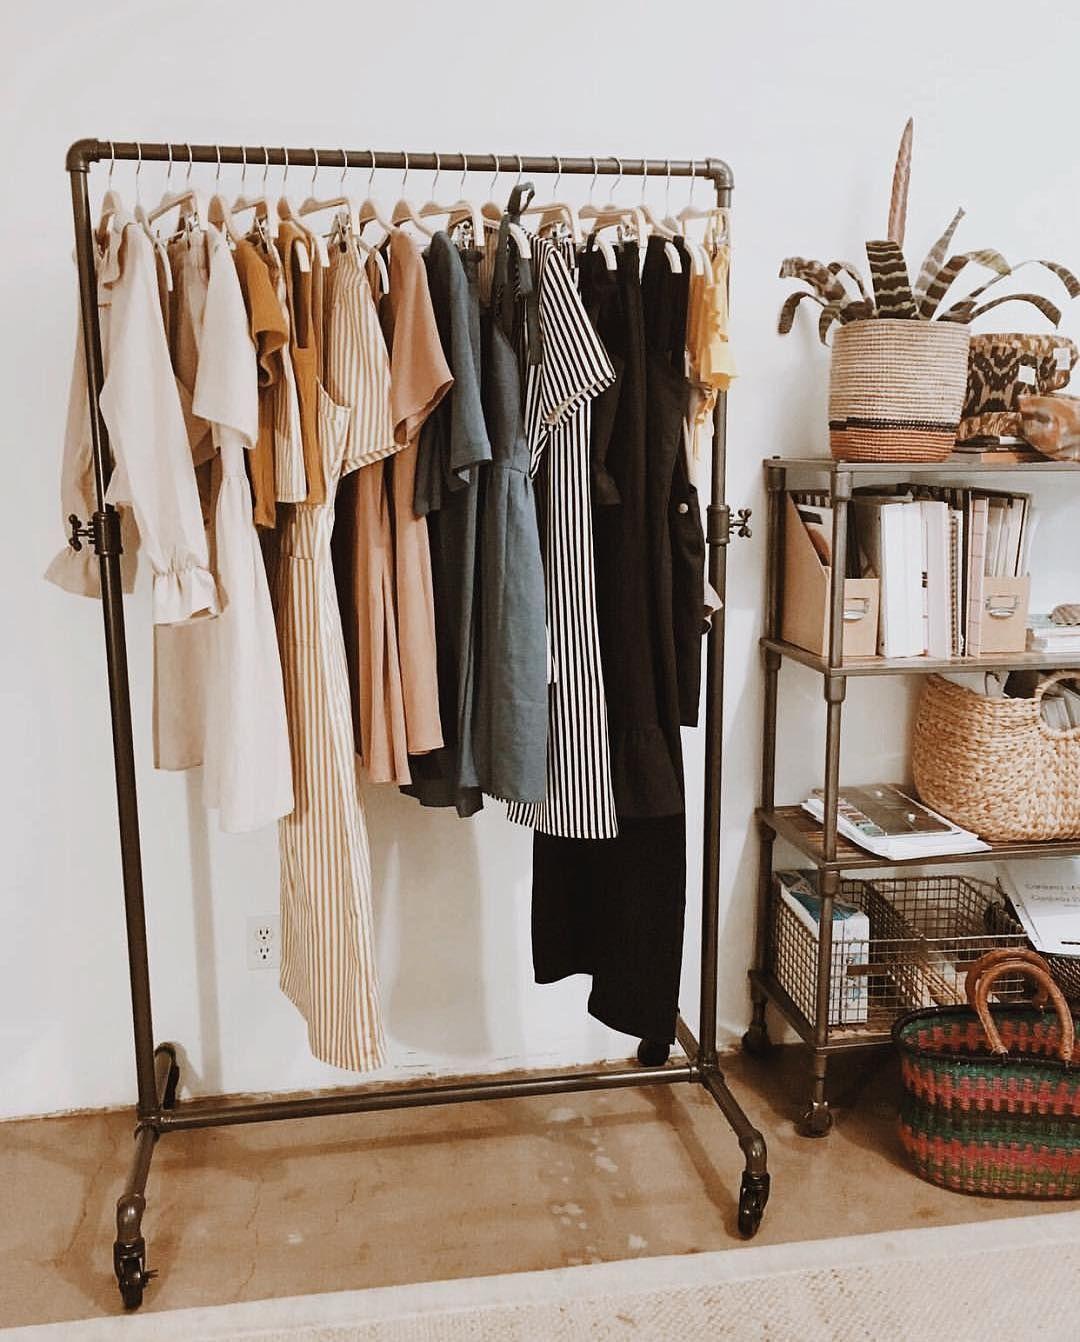 Wardrobes Clothing Racks Closet Storage Clothes